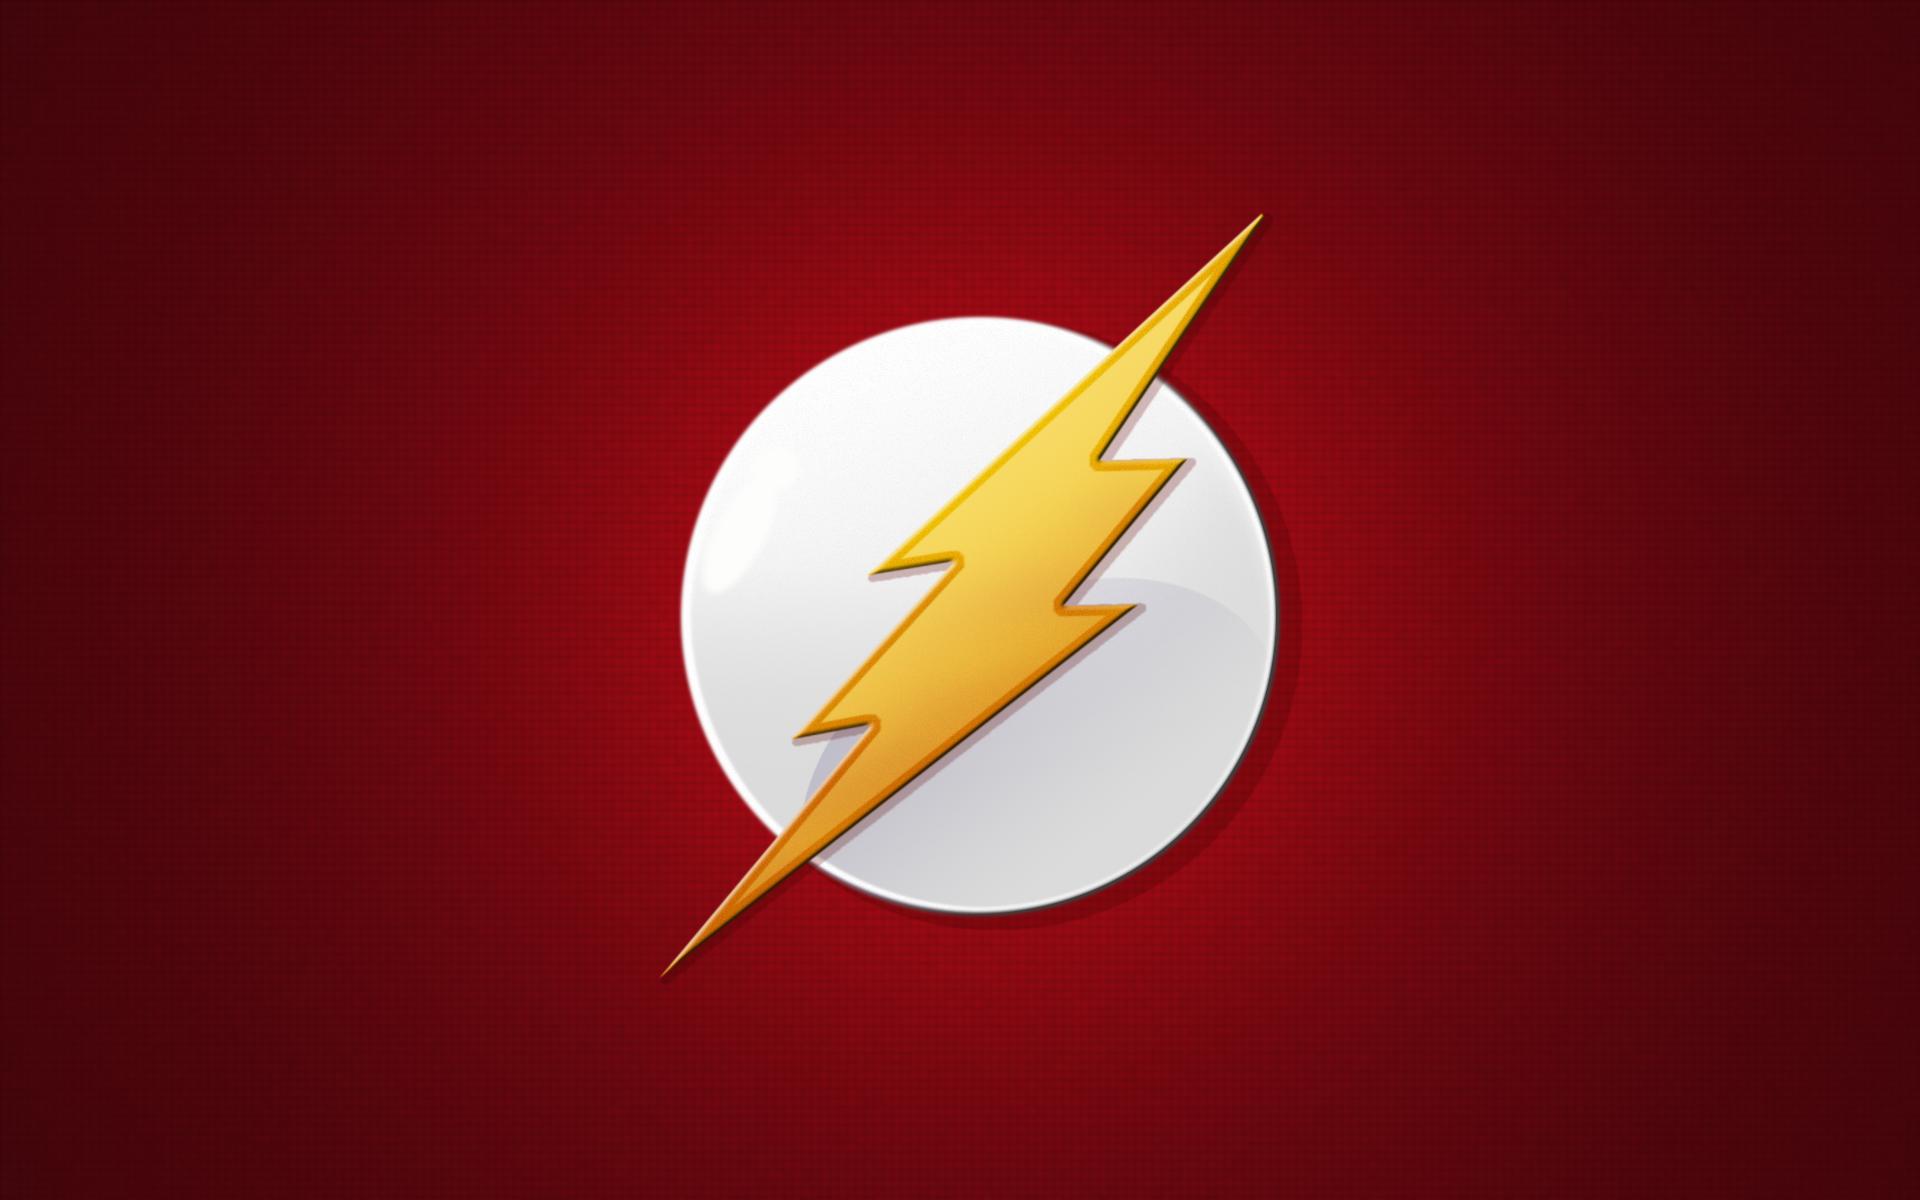 Desktops Logos Superhero Logo Flash wallpapers HD   192053 1920x1200